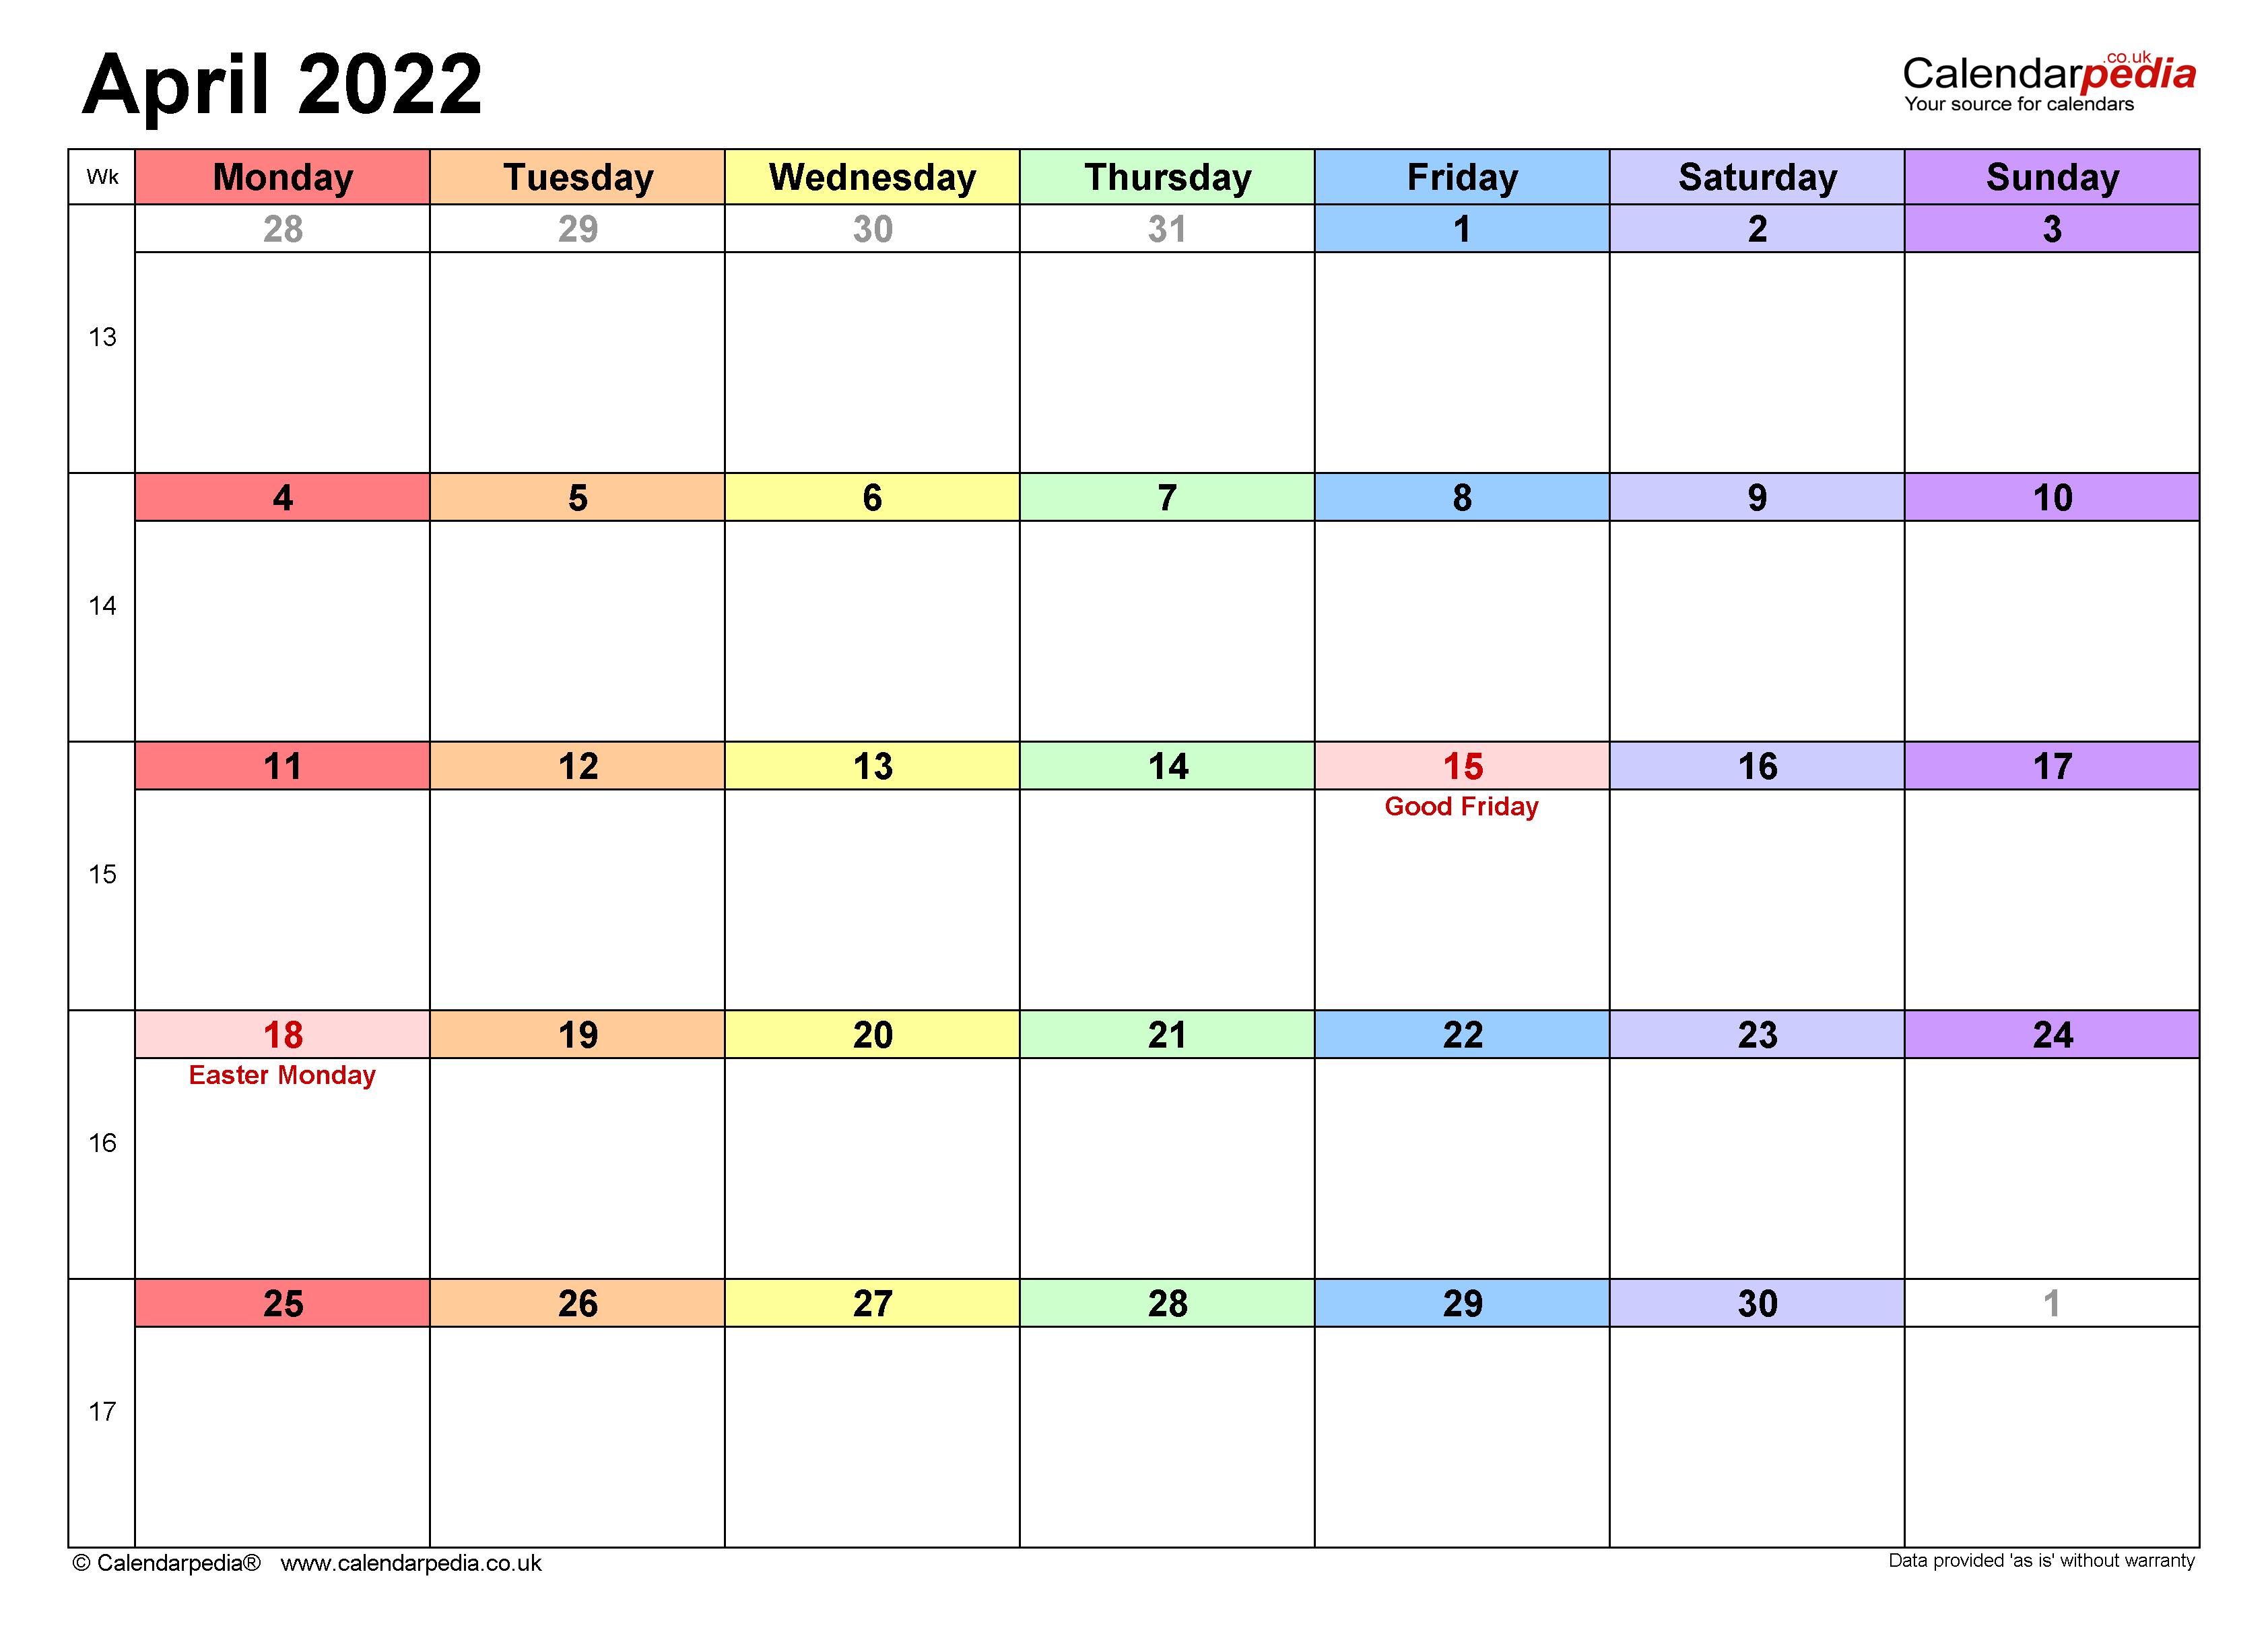 Calendar April 2022 Uk With Excel, Word And Pdf Templates Regarding Blank Calendar April 2022 Printable February